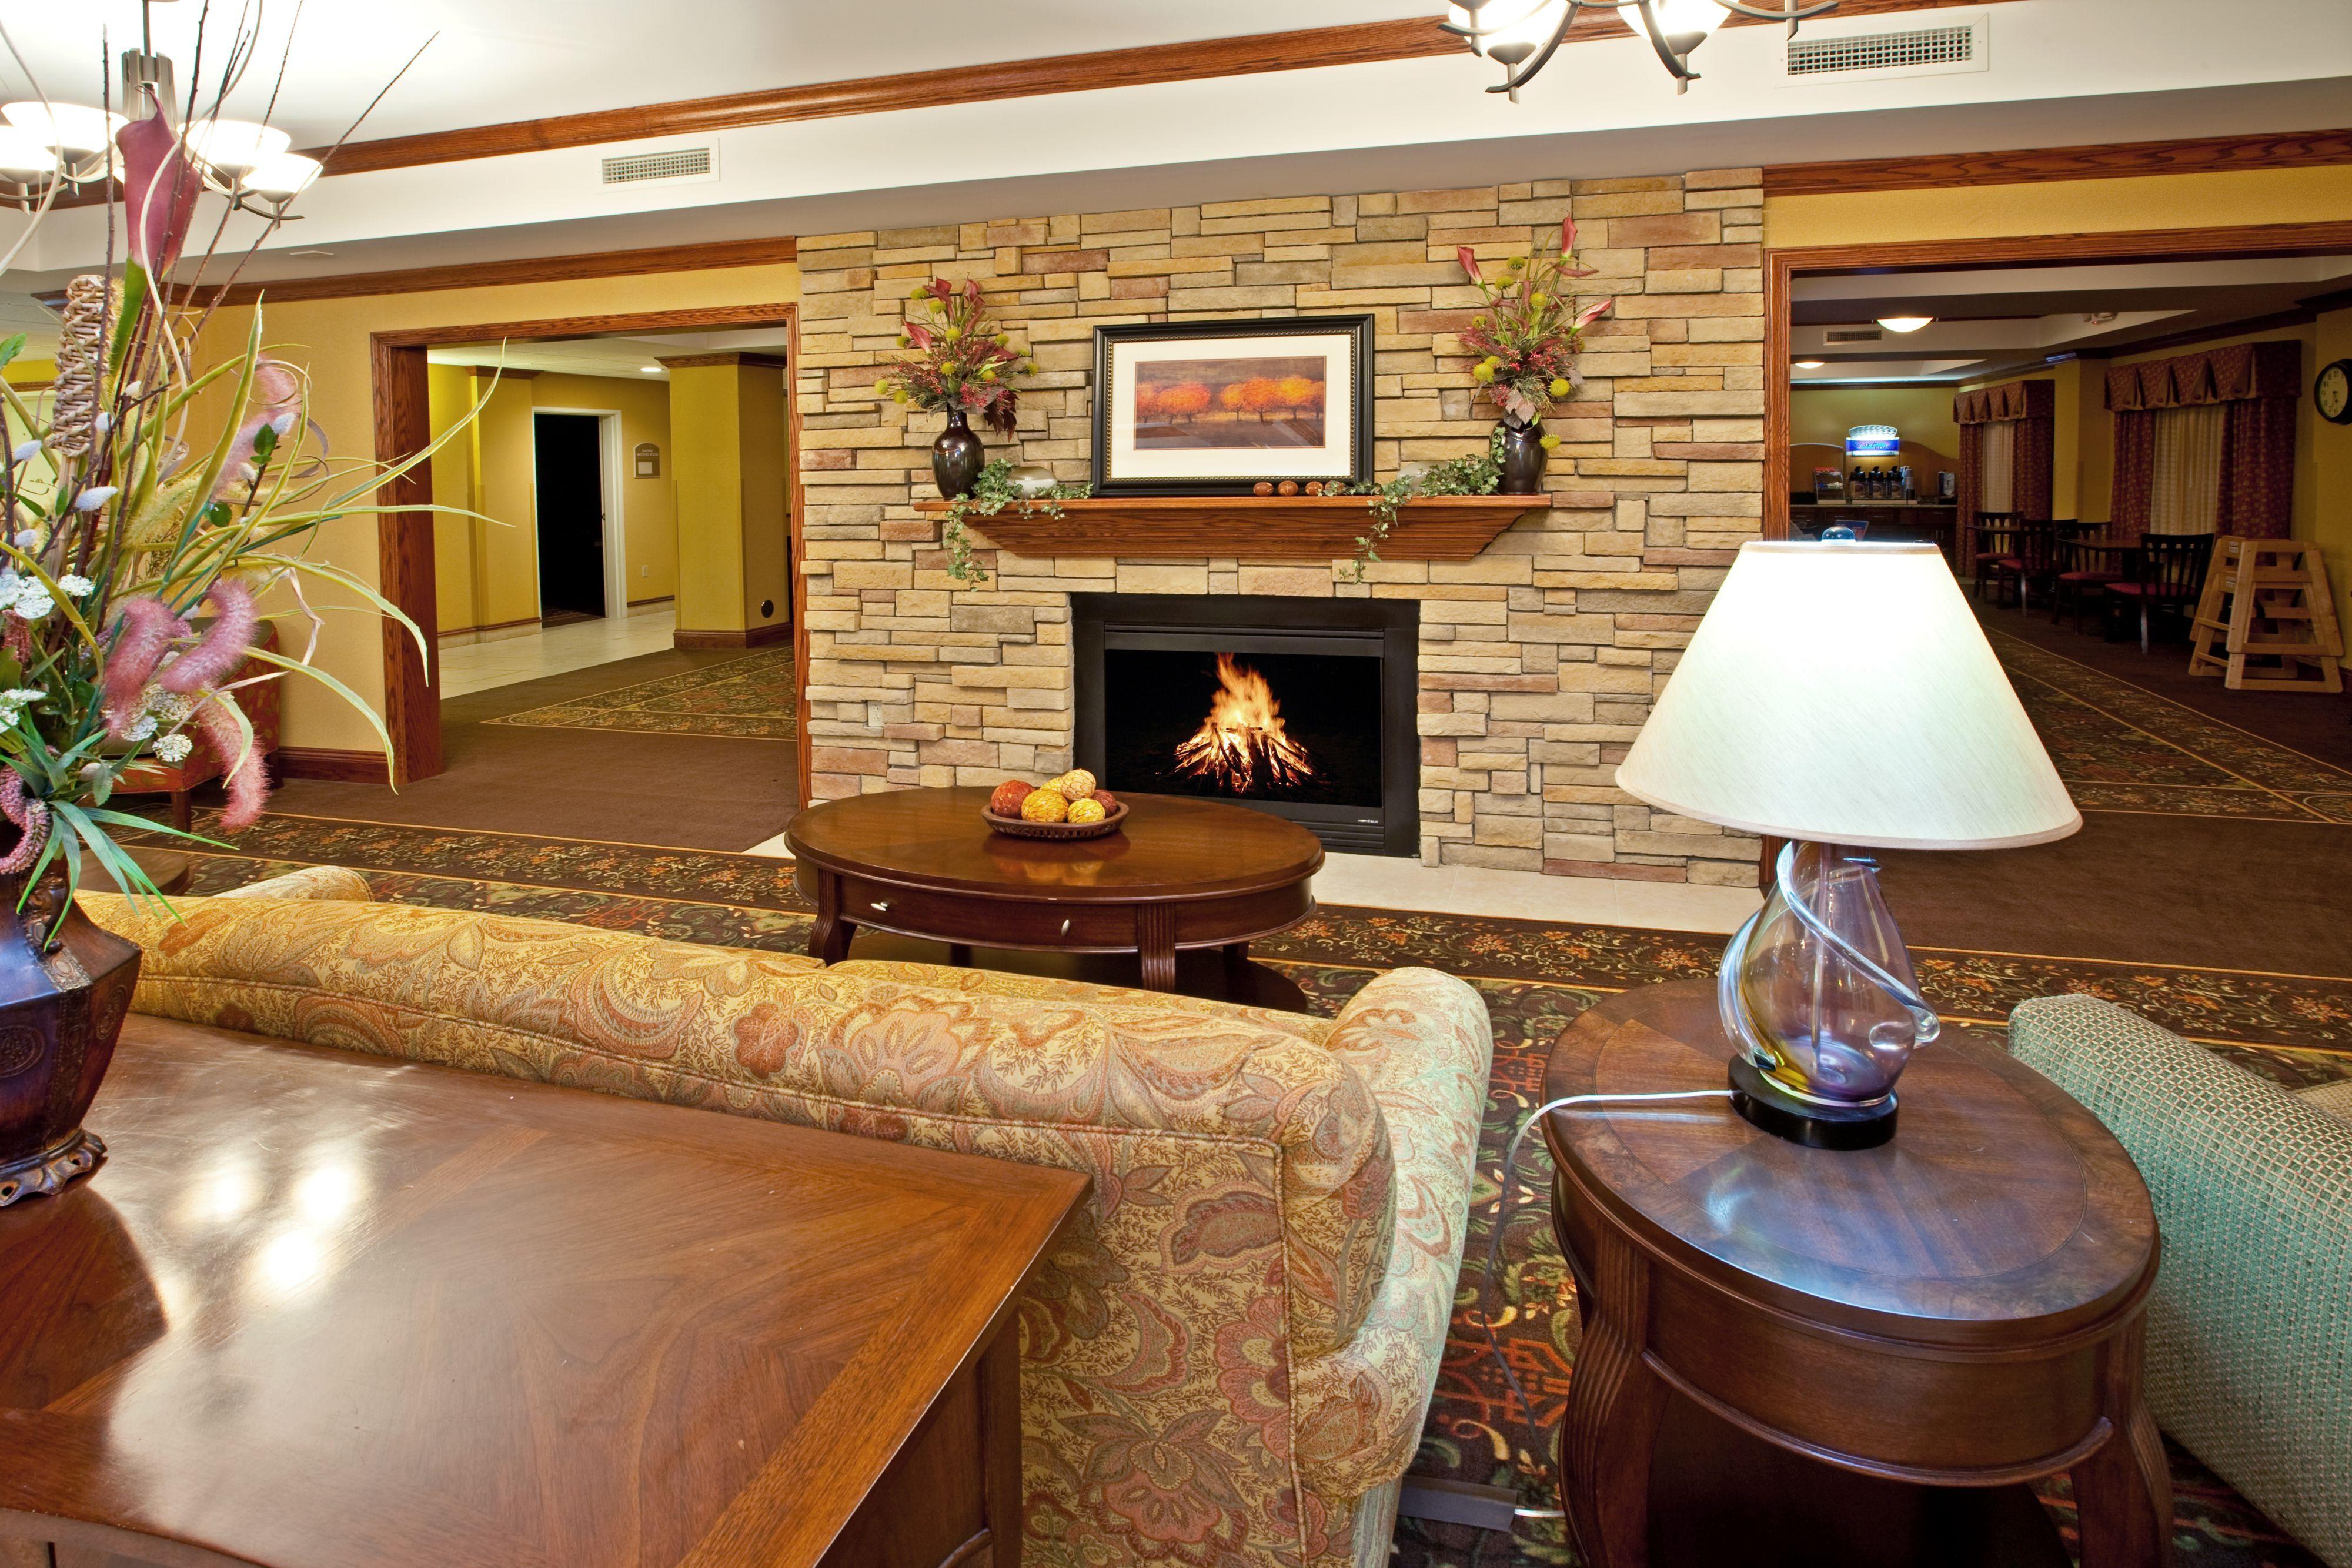 Holiday Inn Express & Suites Vandalia image 4